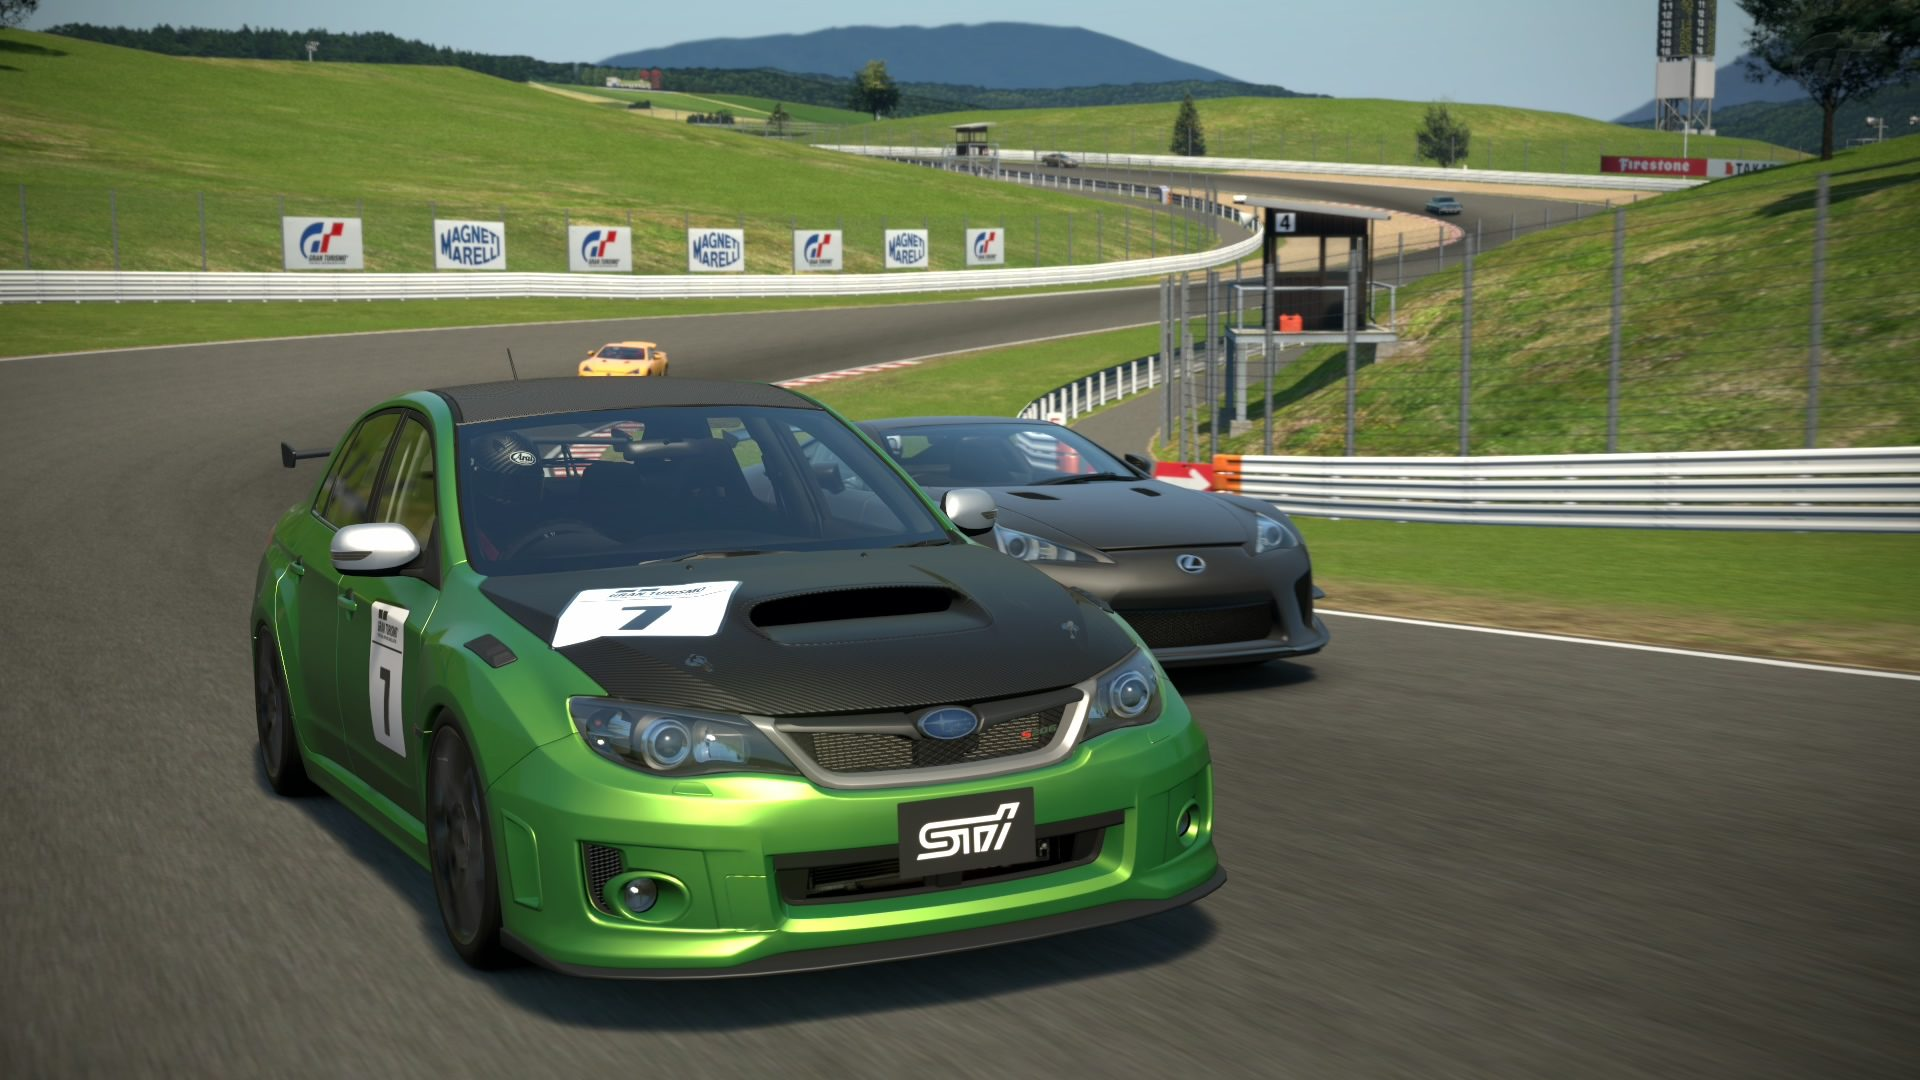 Apricot Hill Raceway_36.jpg